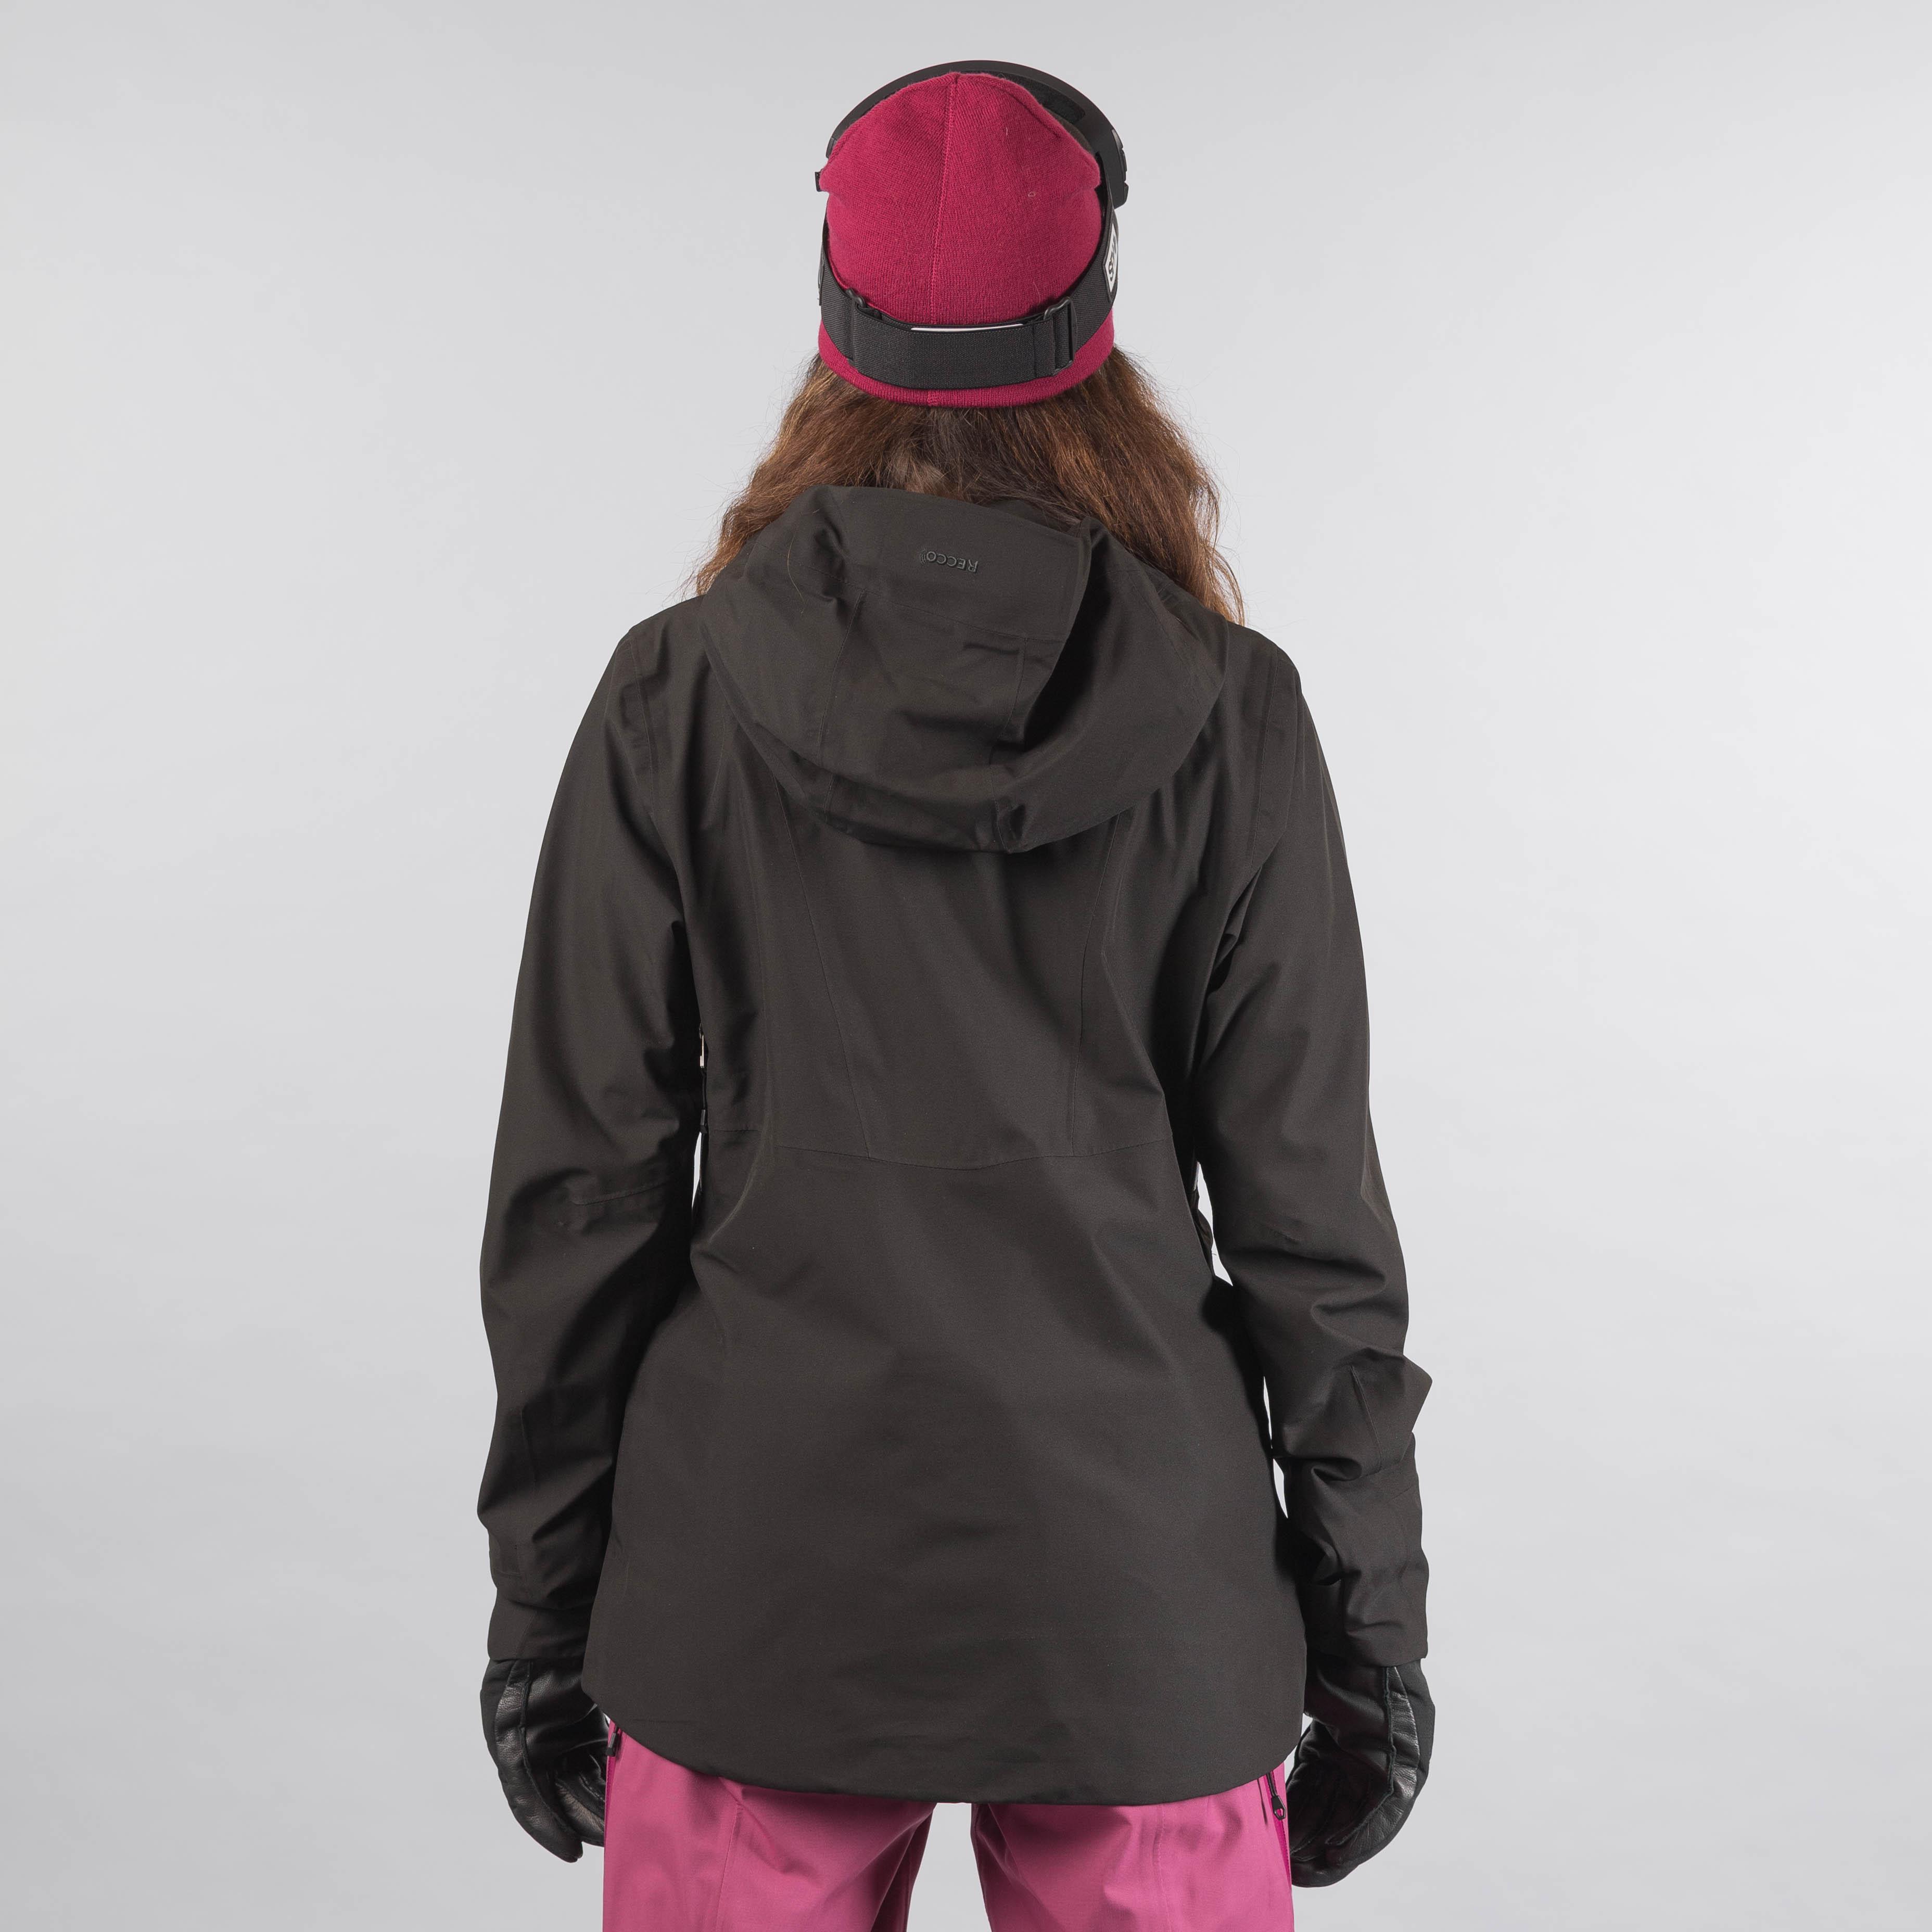 Stranda 2L W Jacket